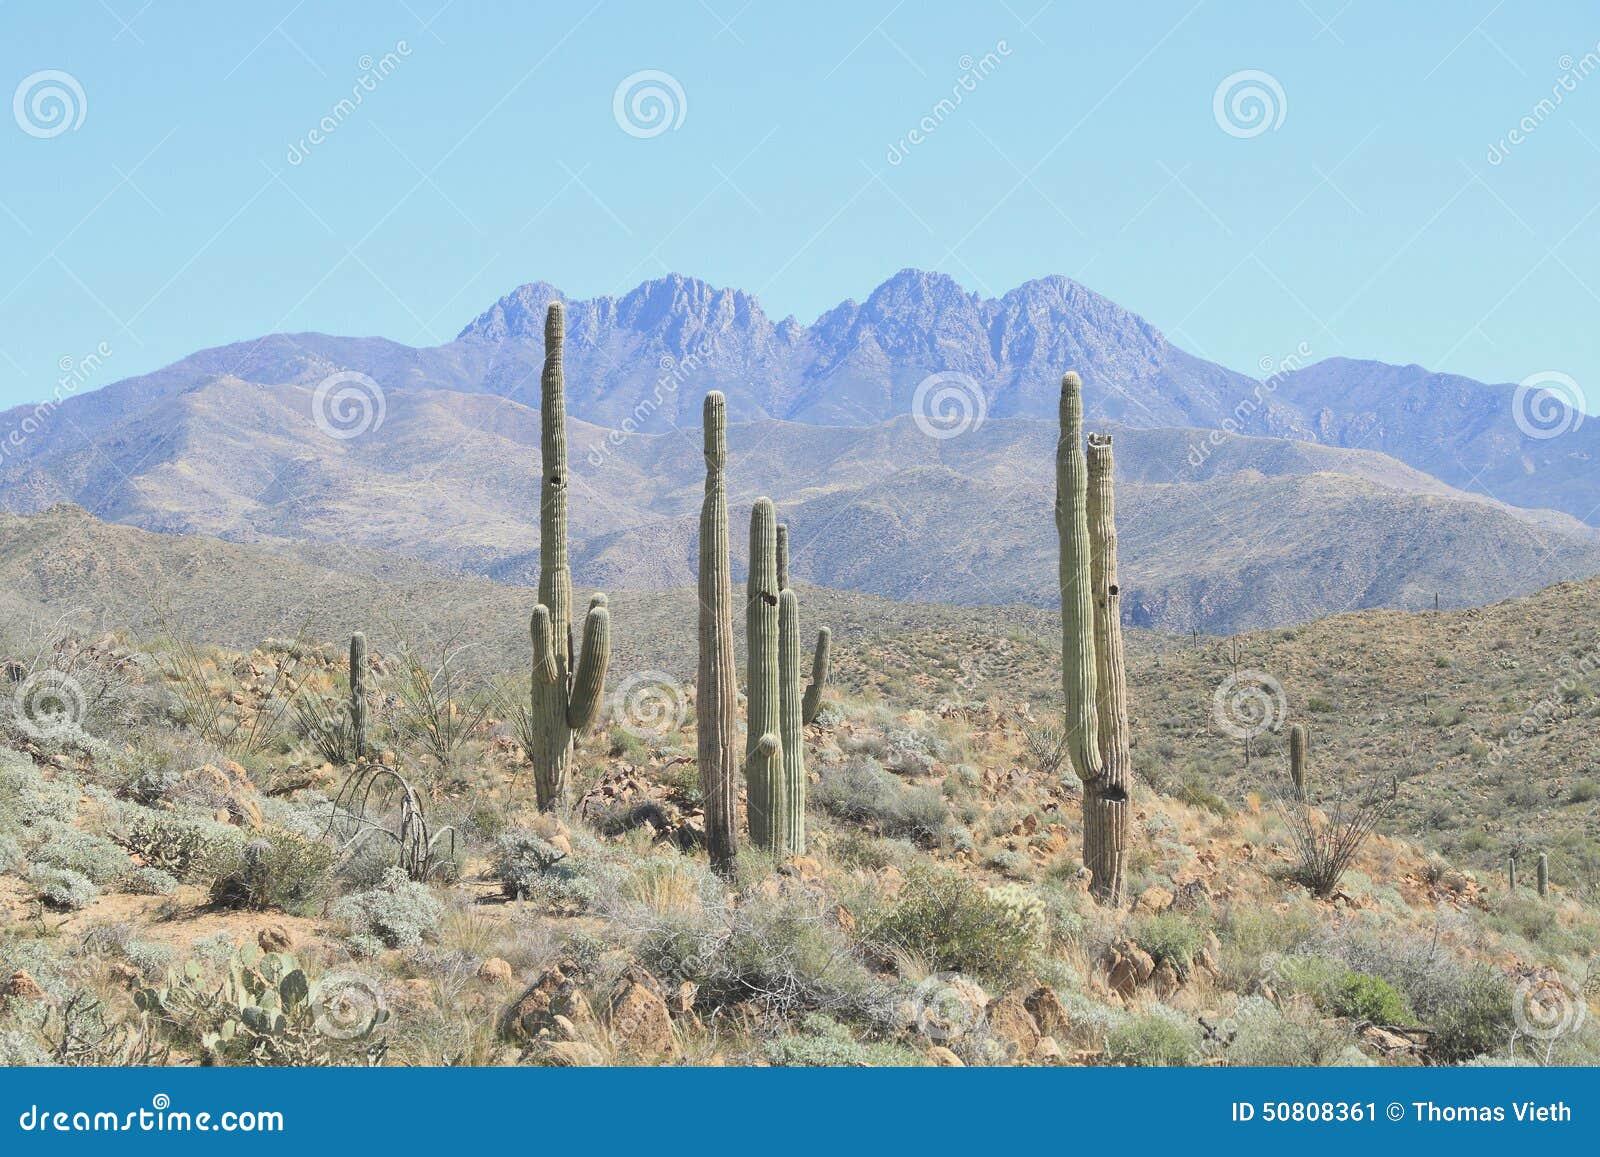 USA, Arizona: Saguaro Landscape at the Foothills of Four Peaks